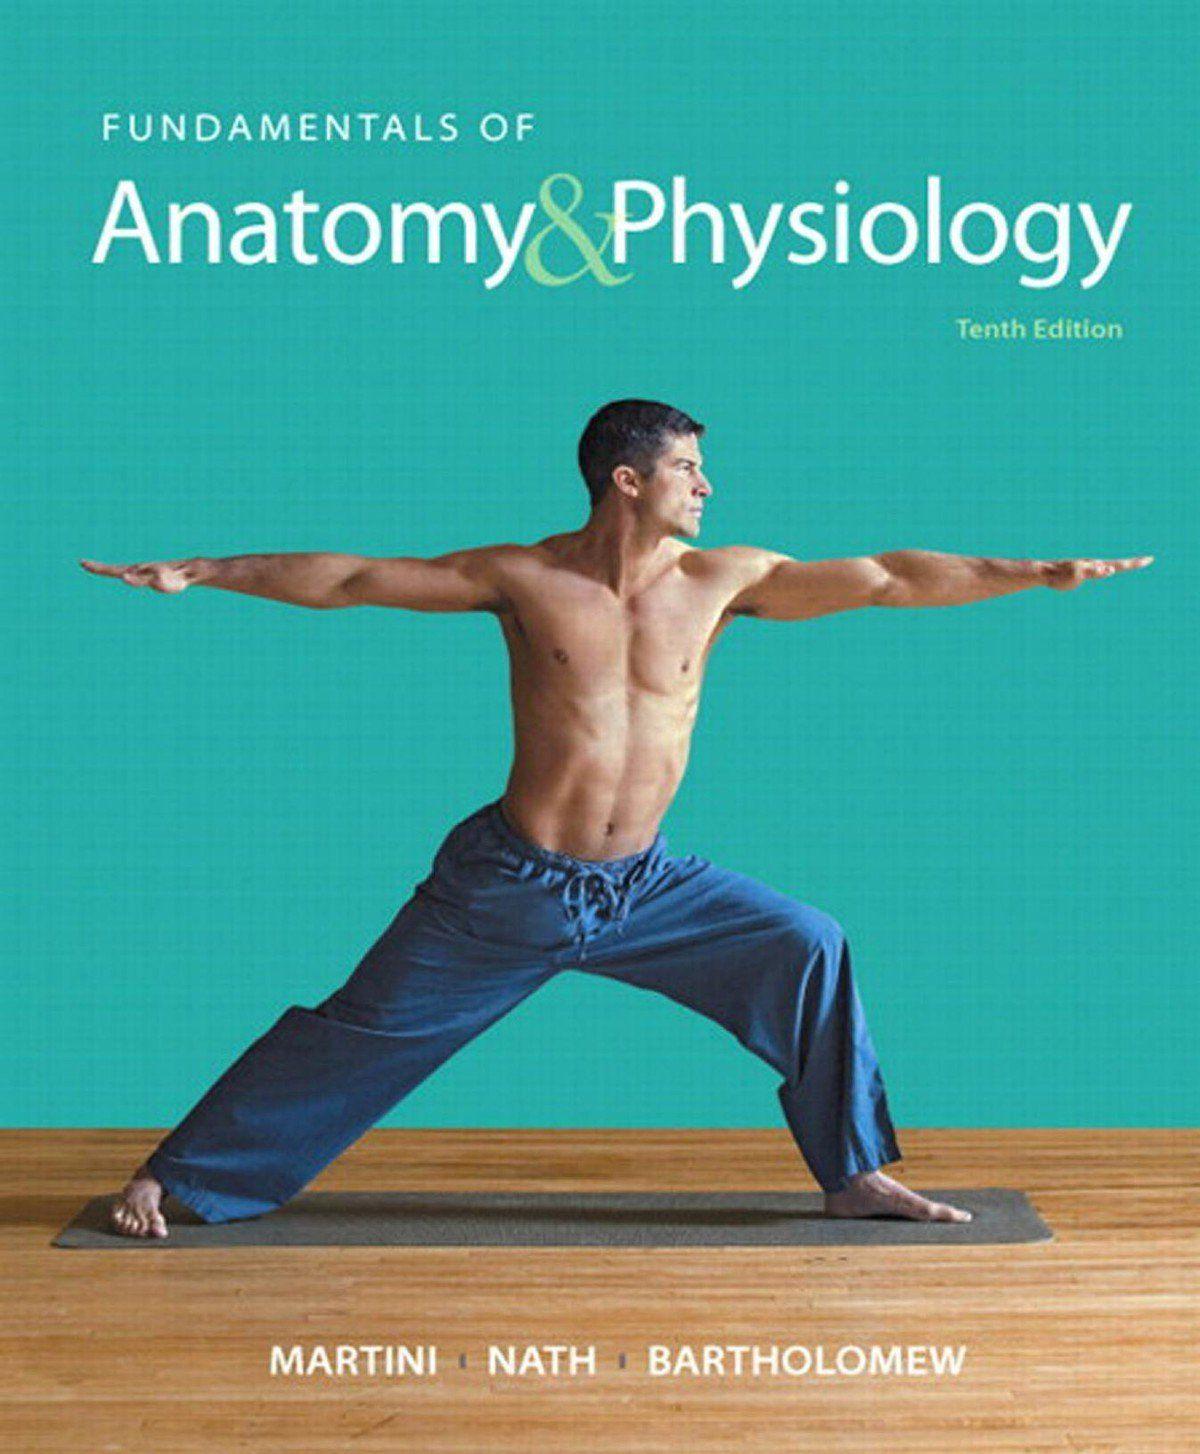 Pin by 9plr.com on Best College PDF Textbooks | Pinterest | Anatomy ...